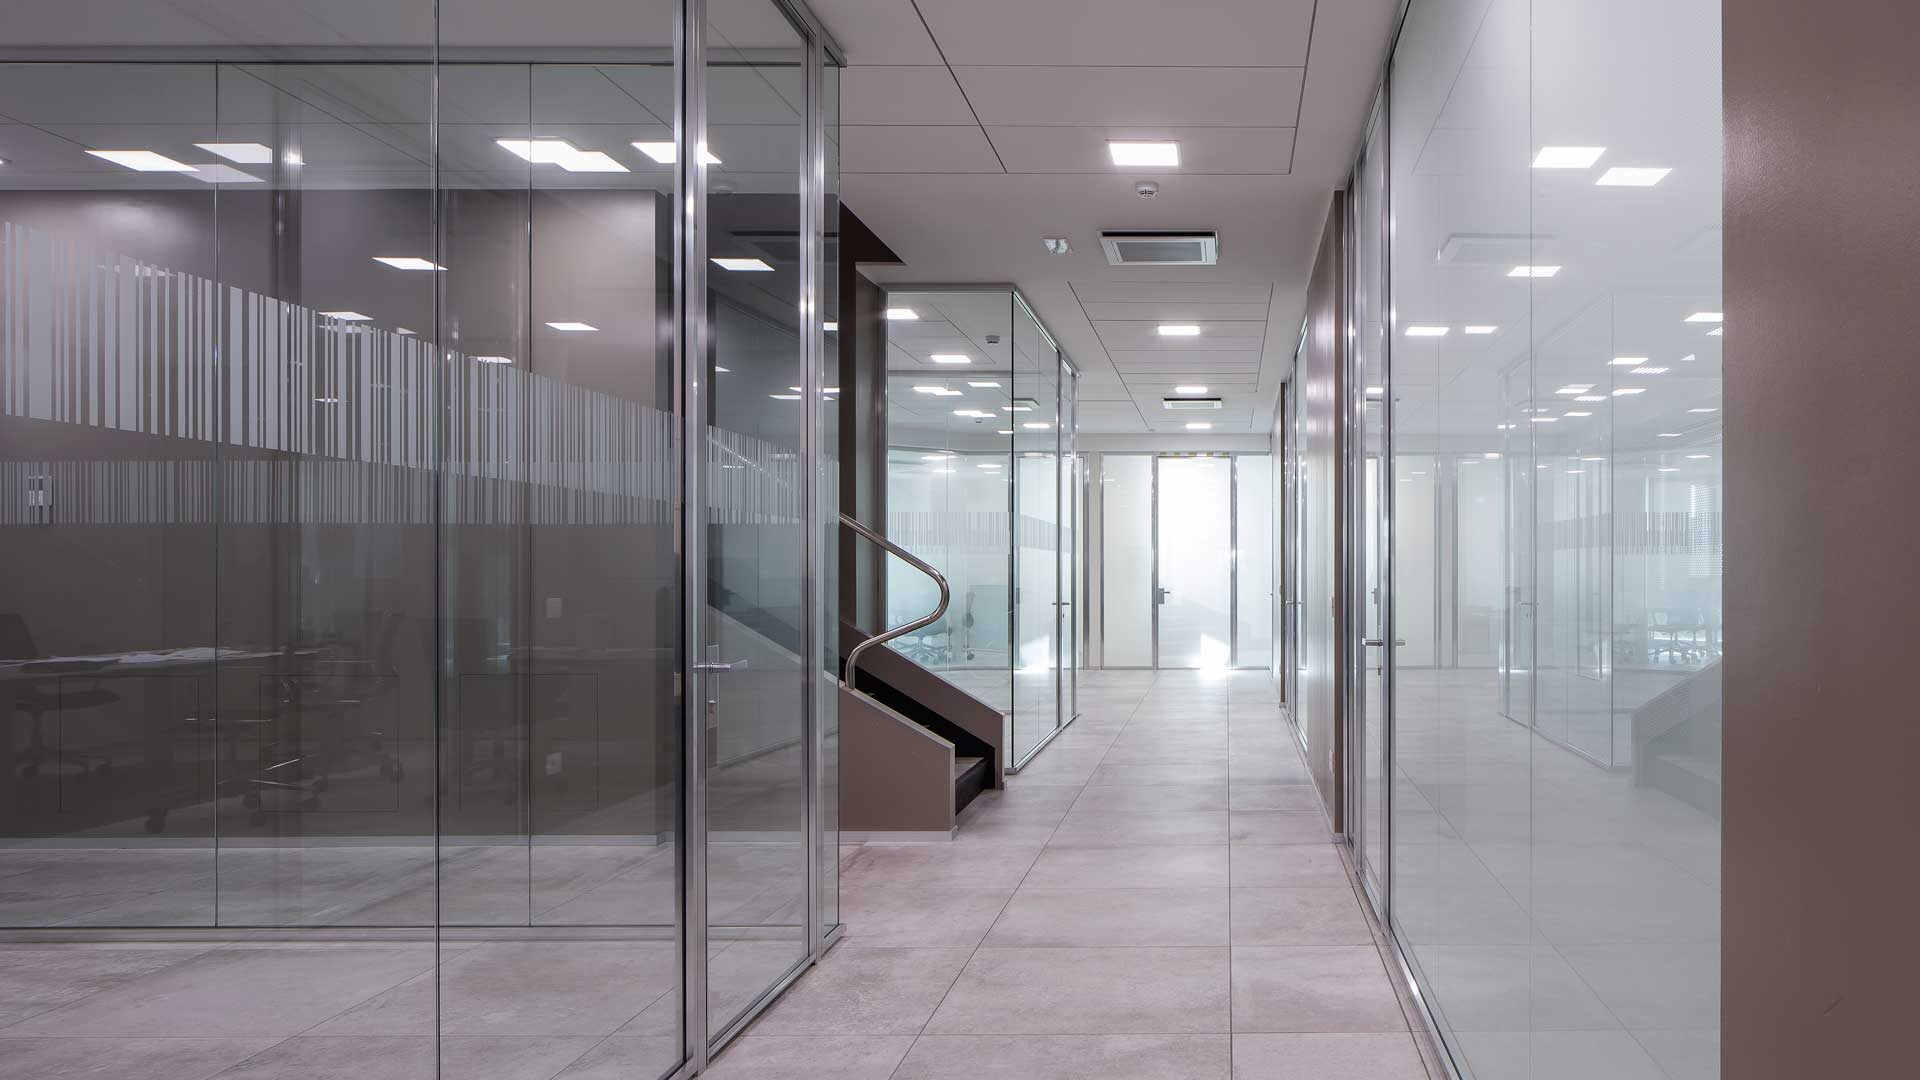 Pareti-divisorie-ufficio-in-vetro-Viemme-Level-Office-Landscape